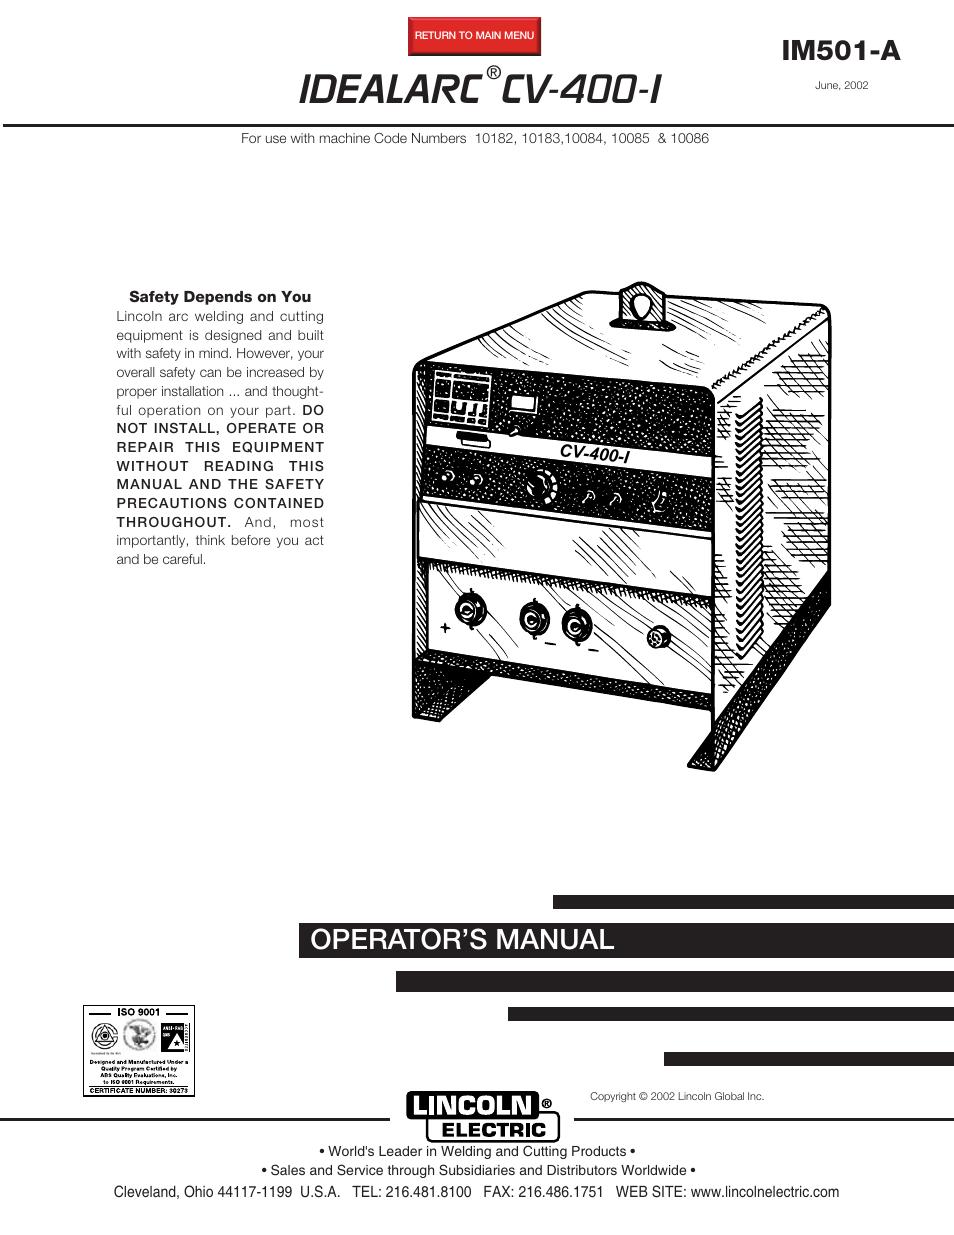 lincoln electric idealarc cv 400 i user manual 44 pages rh manualsdir com Lincoln Plug Wiring Diagram 2000 Lincoln Navigator Engine Diagram